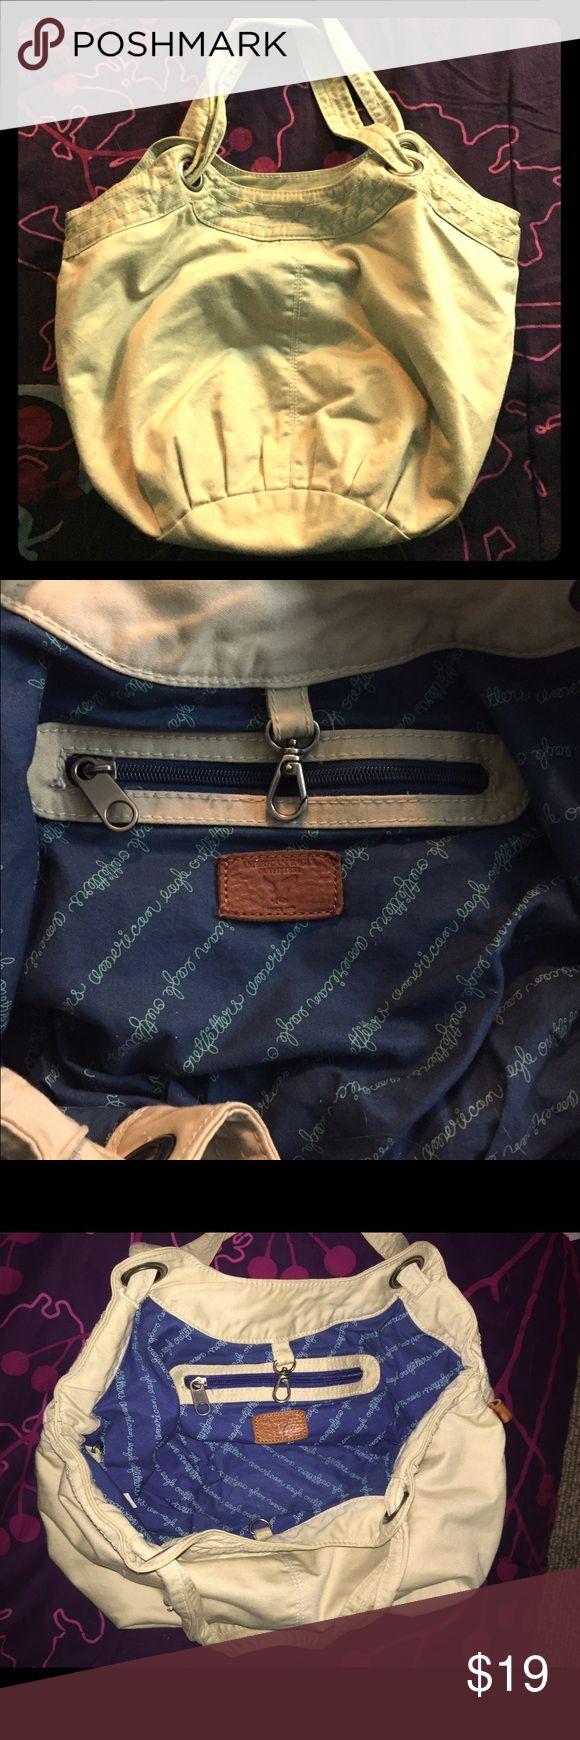 American Eagle Handbag (Cream/Khaki) Roomy Handbag. Excellent Condition. American Eagle Outfitters Bags Hobos